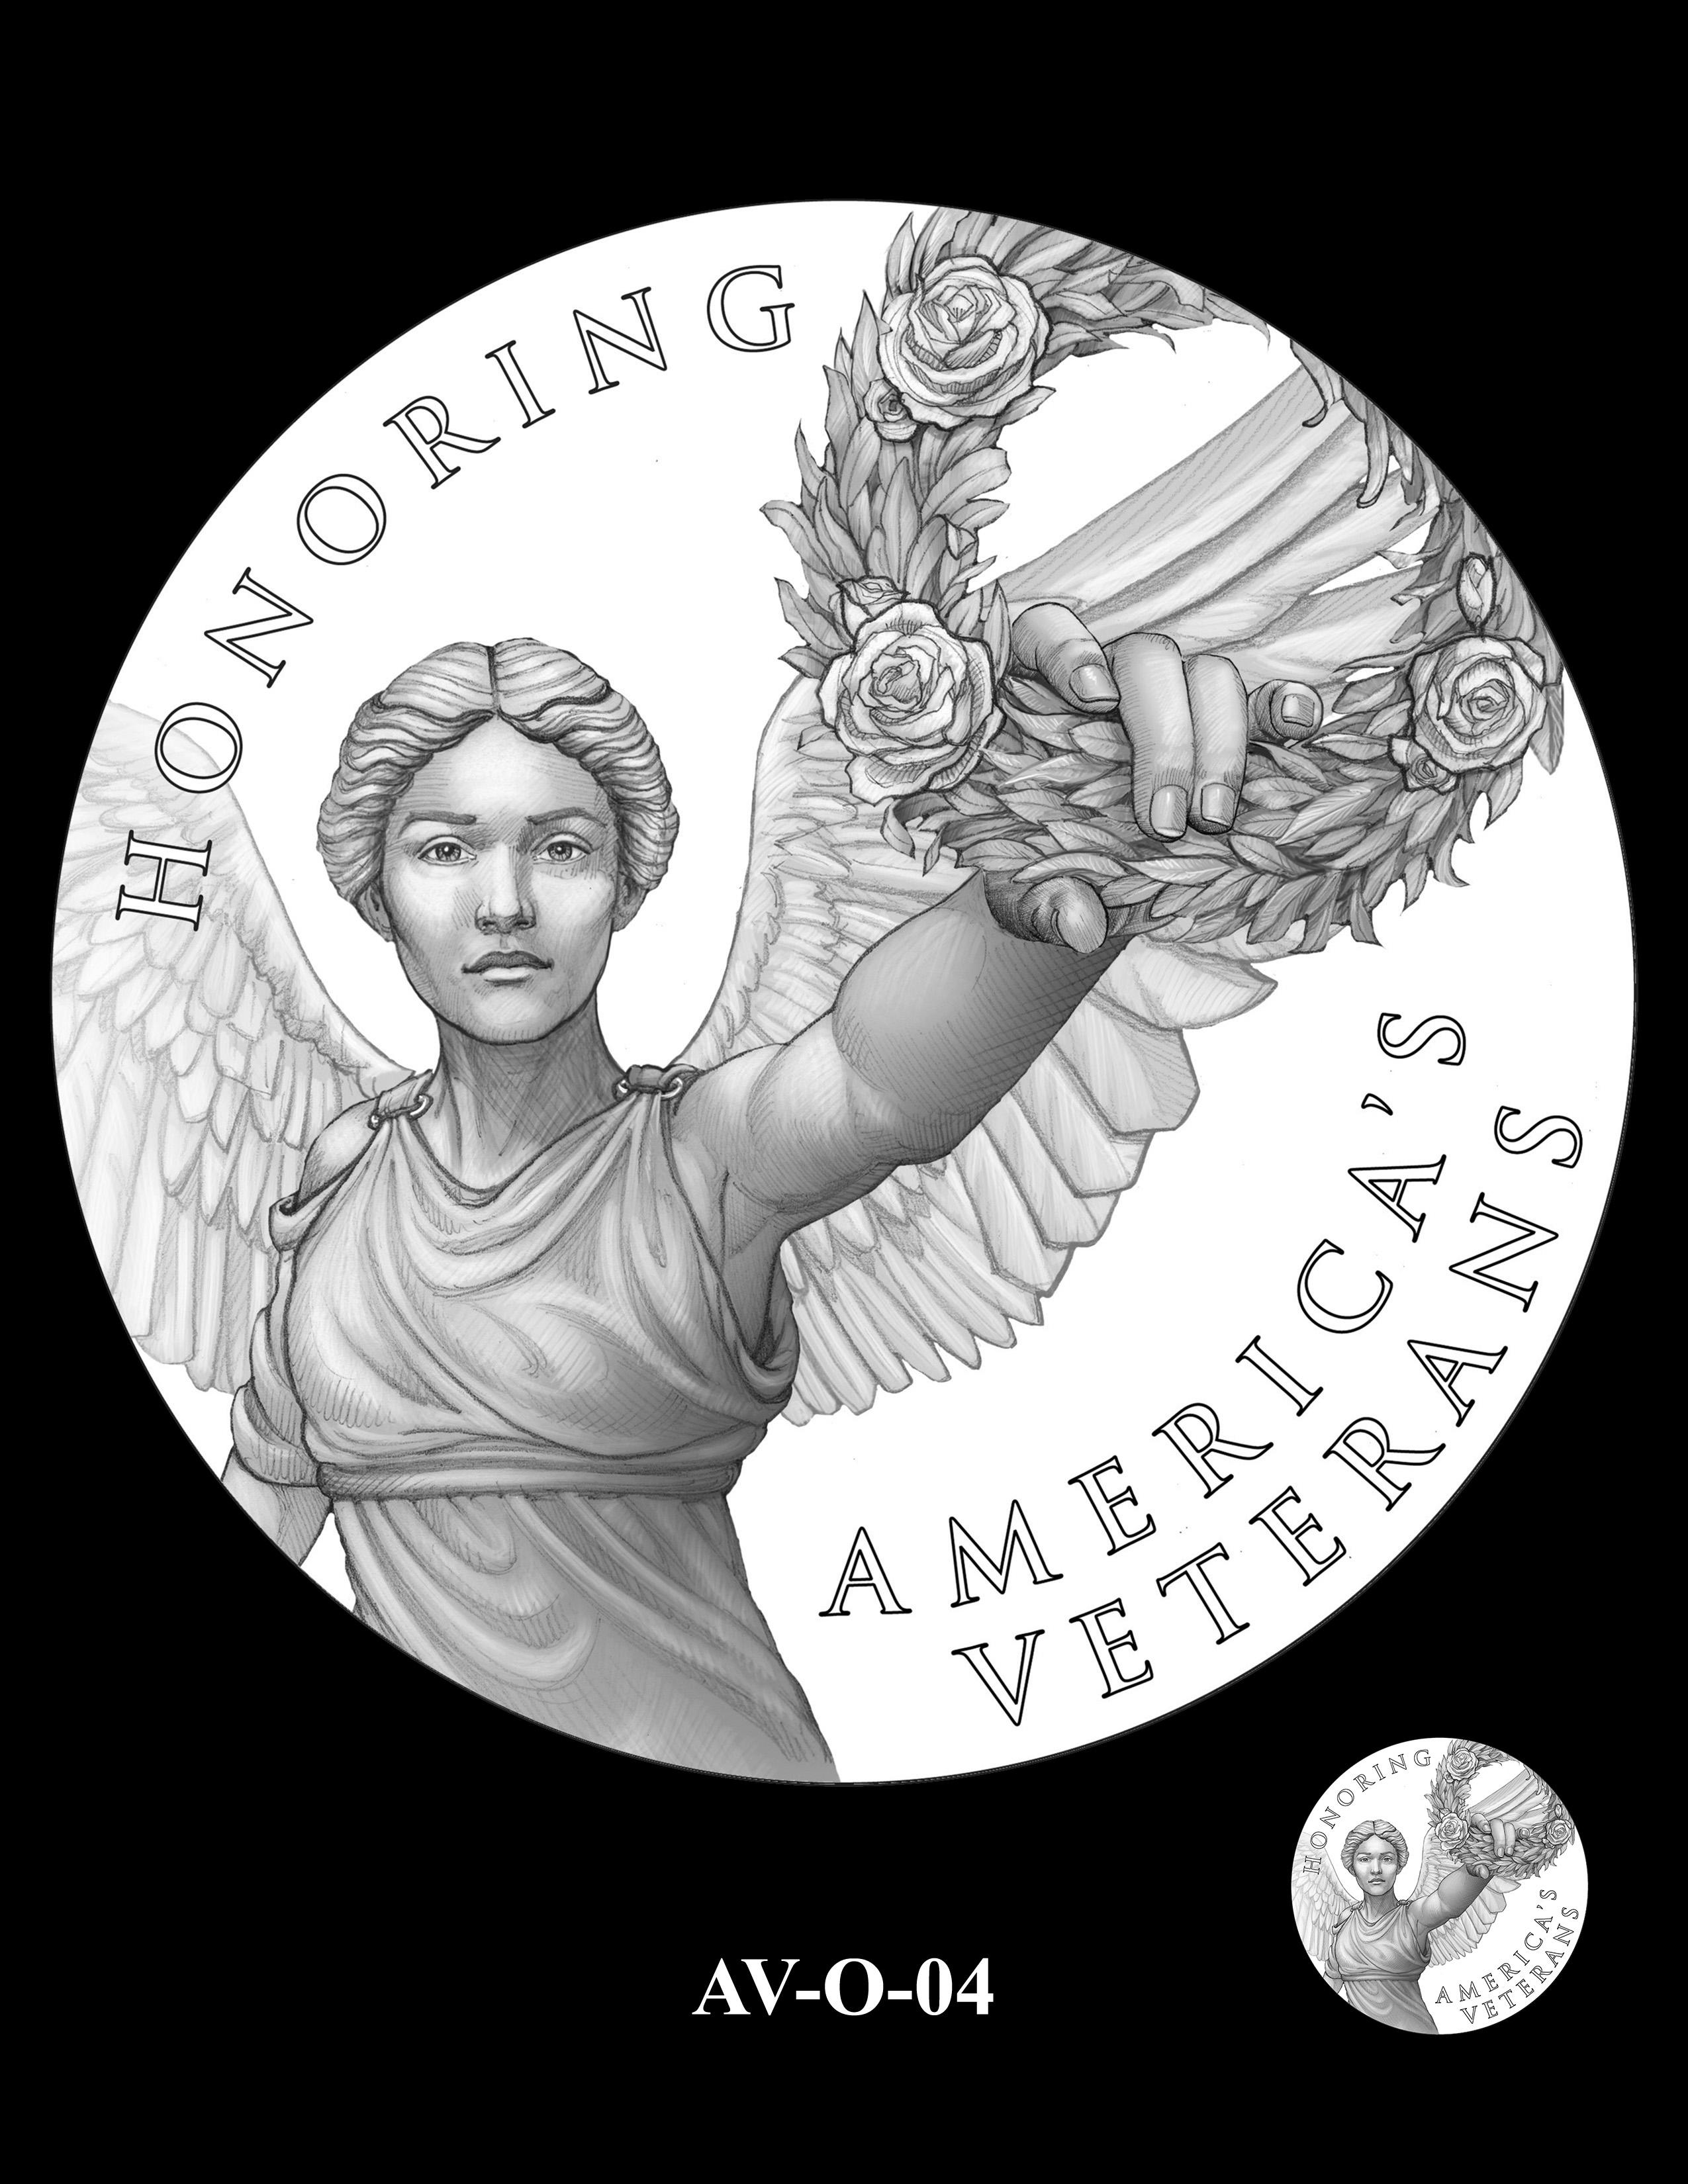 AV-O-04 - American Veterans Medal